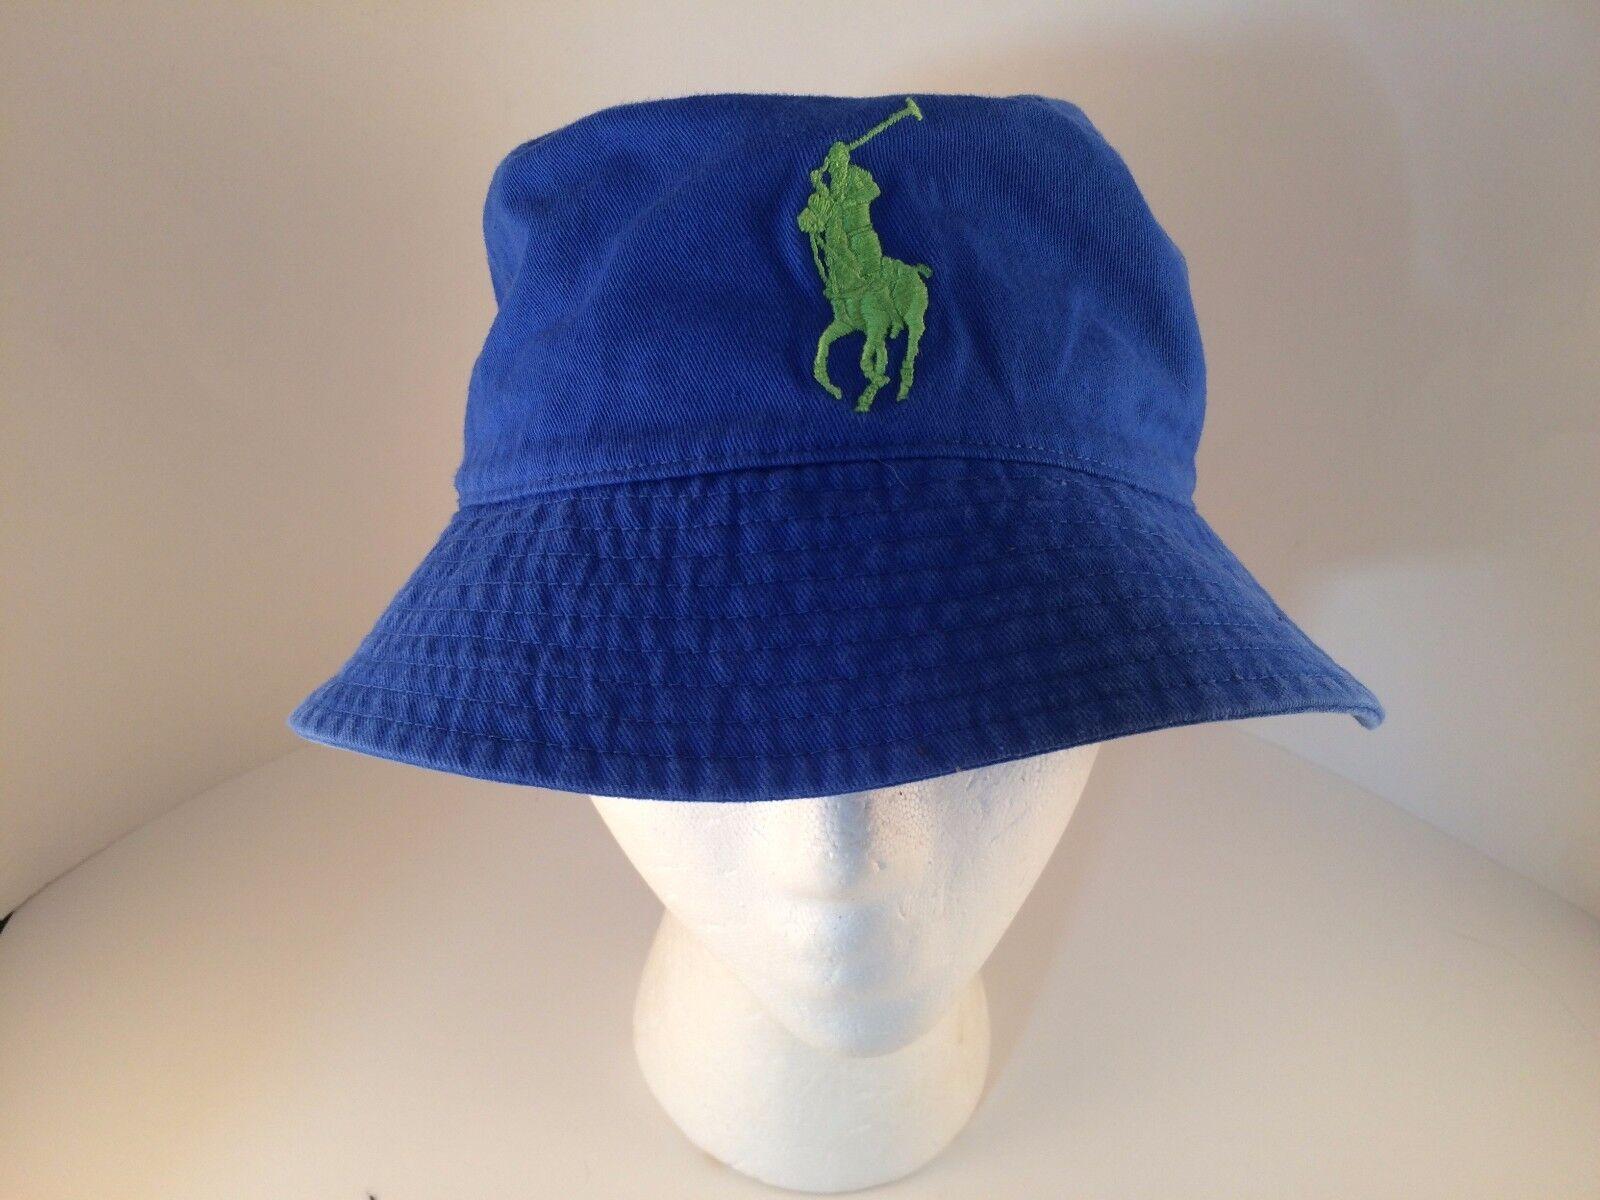 6c8ff6359de Polo Ralph Lauren Medium Blue Bucket Beach Hat Big Pony Toddler Size ...